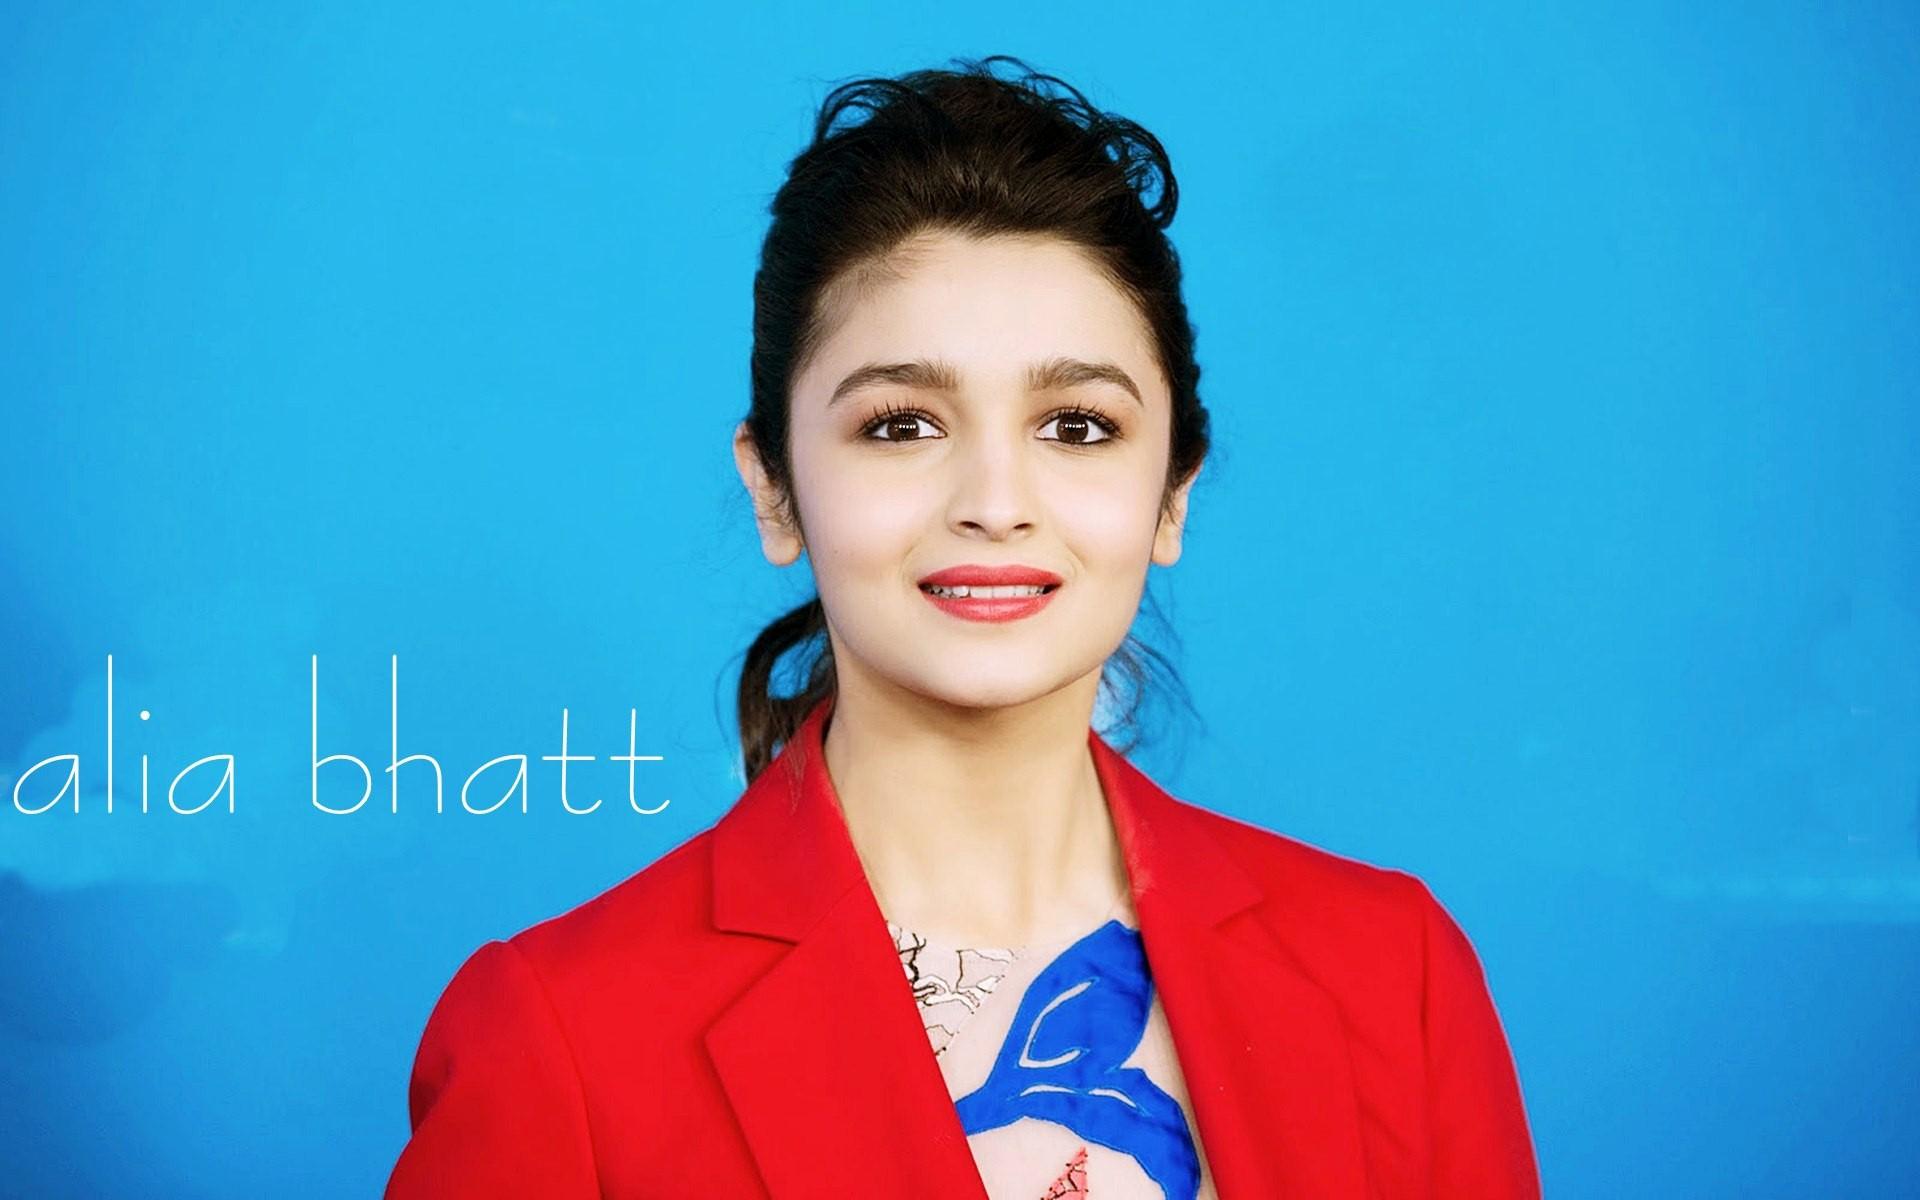 alia Alia bhatt, actress: highway alia is the daughter of mahesh bhatt (director, producer, and screenwriter) and soni razdan,(film actress and director) she has one sister shaheen bhatt, a half sister pooja bhatt, and a half brother rahul bhatt.